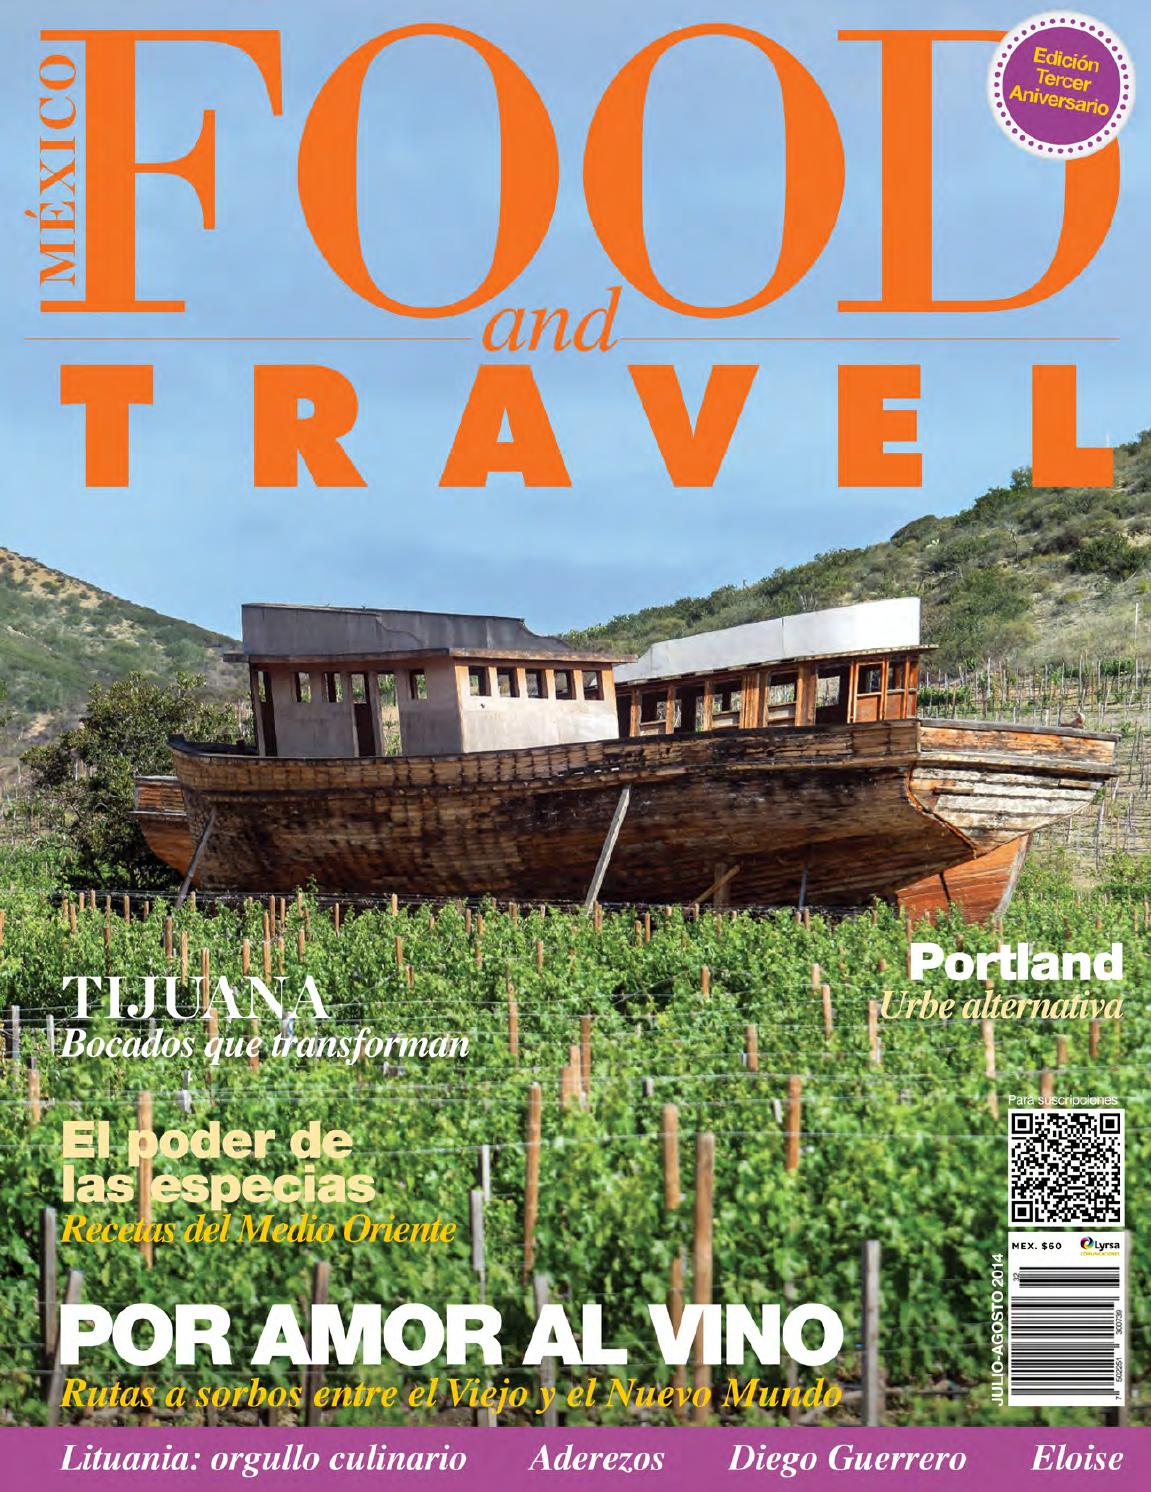 issuu agosto Travel Food Julio 2014 by México and tshQdr